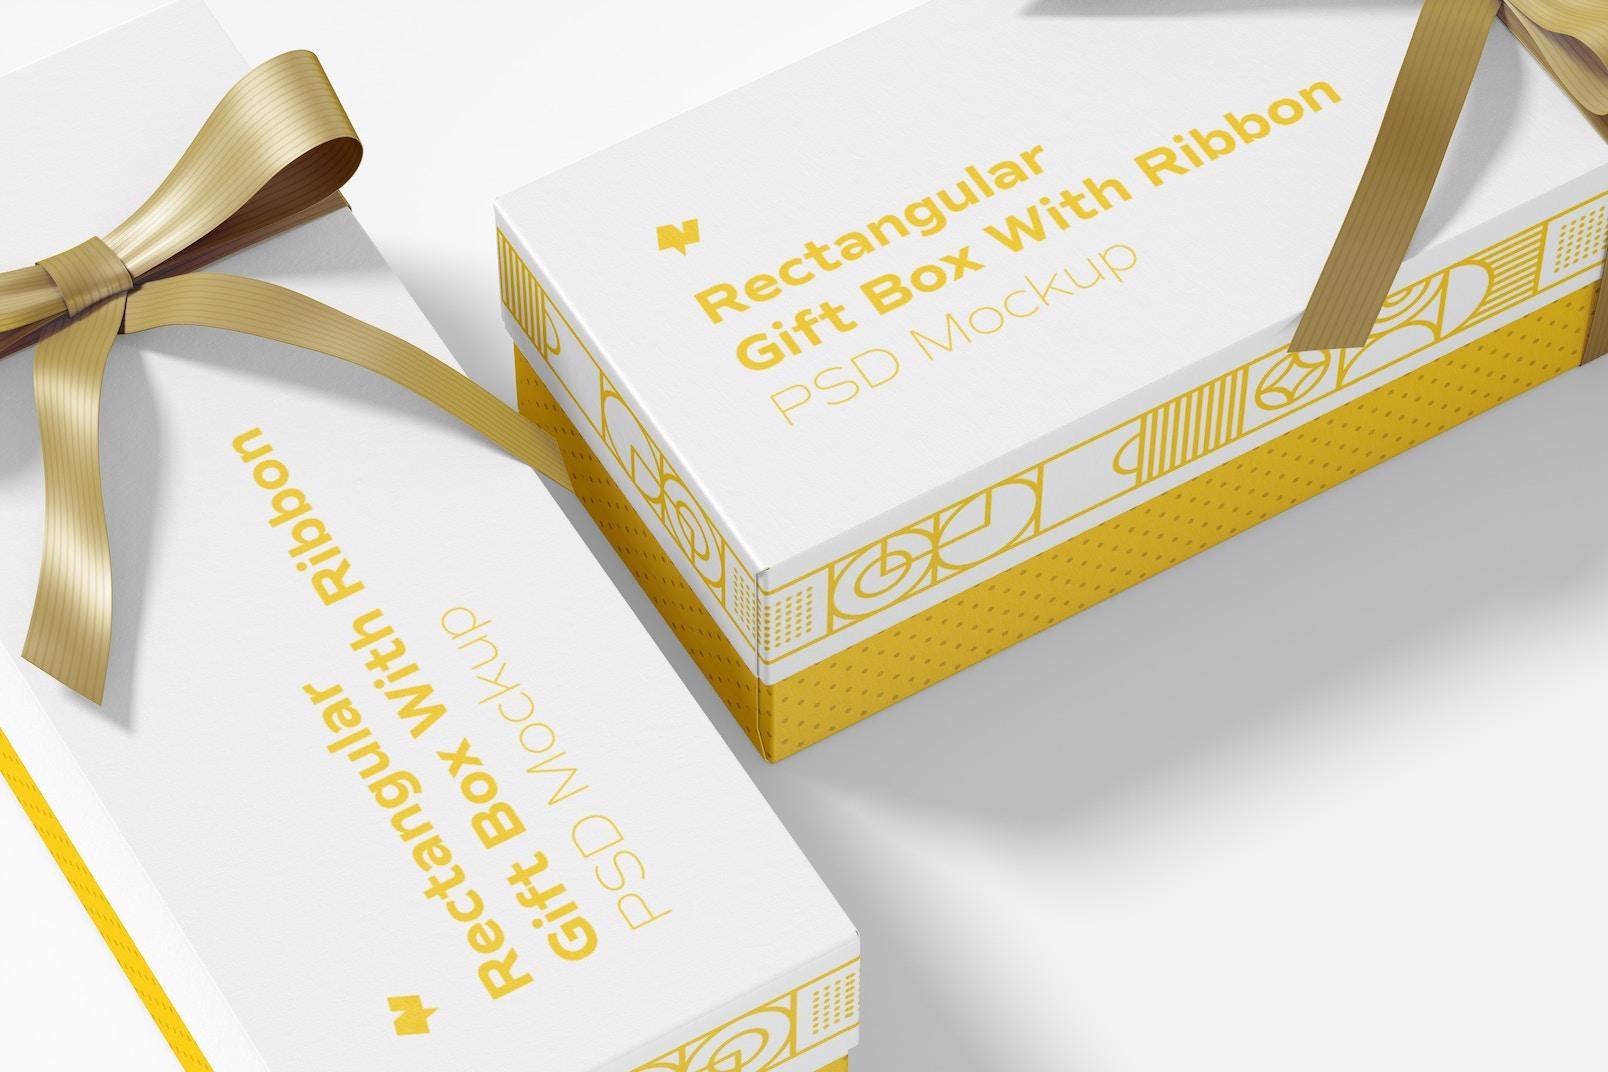 Rectangular Gift Boxes With Ribbon Mockup, Close Up